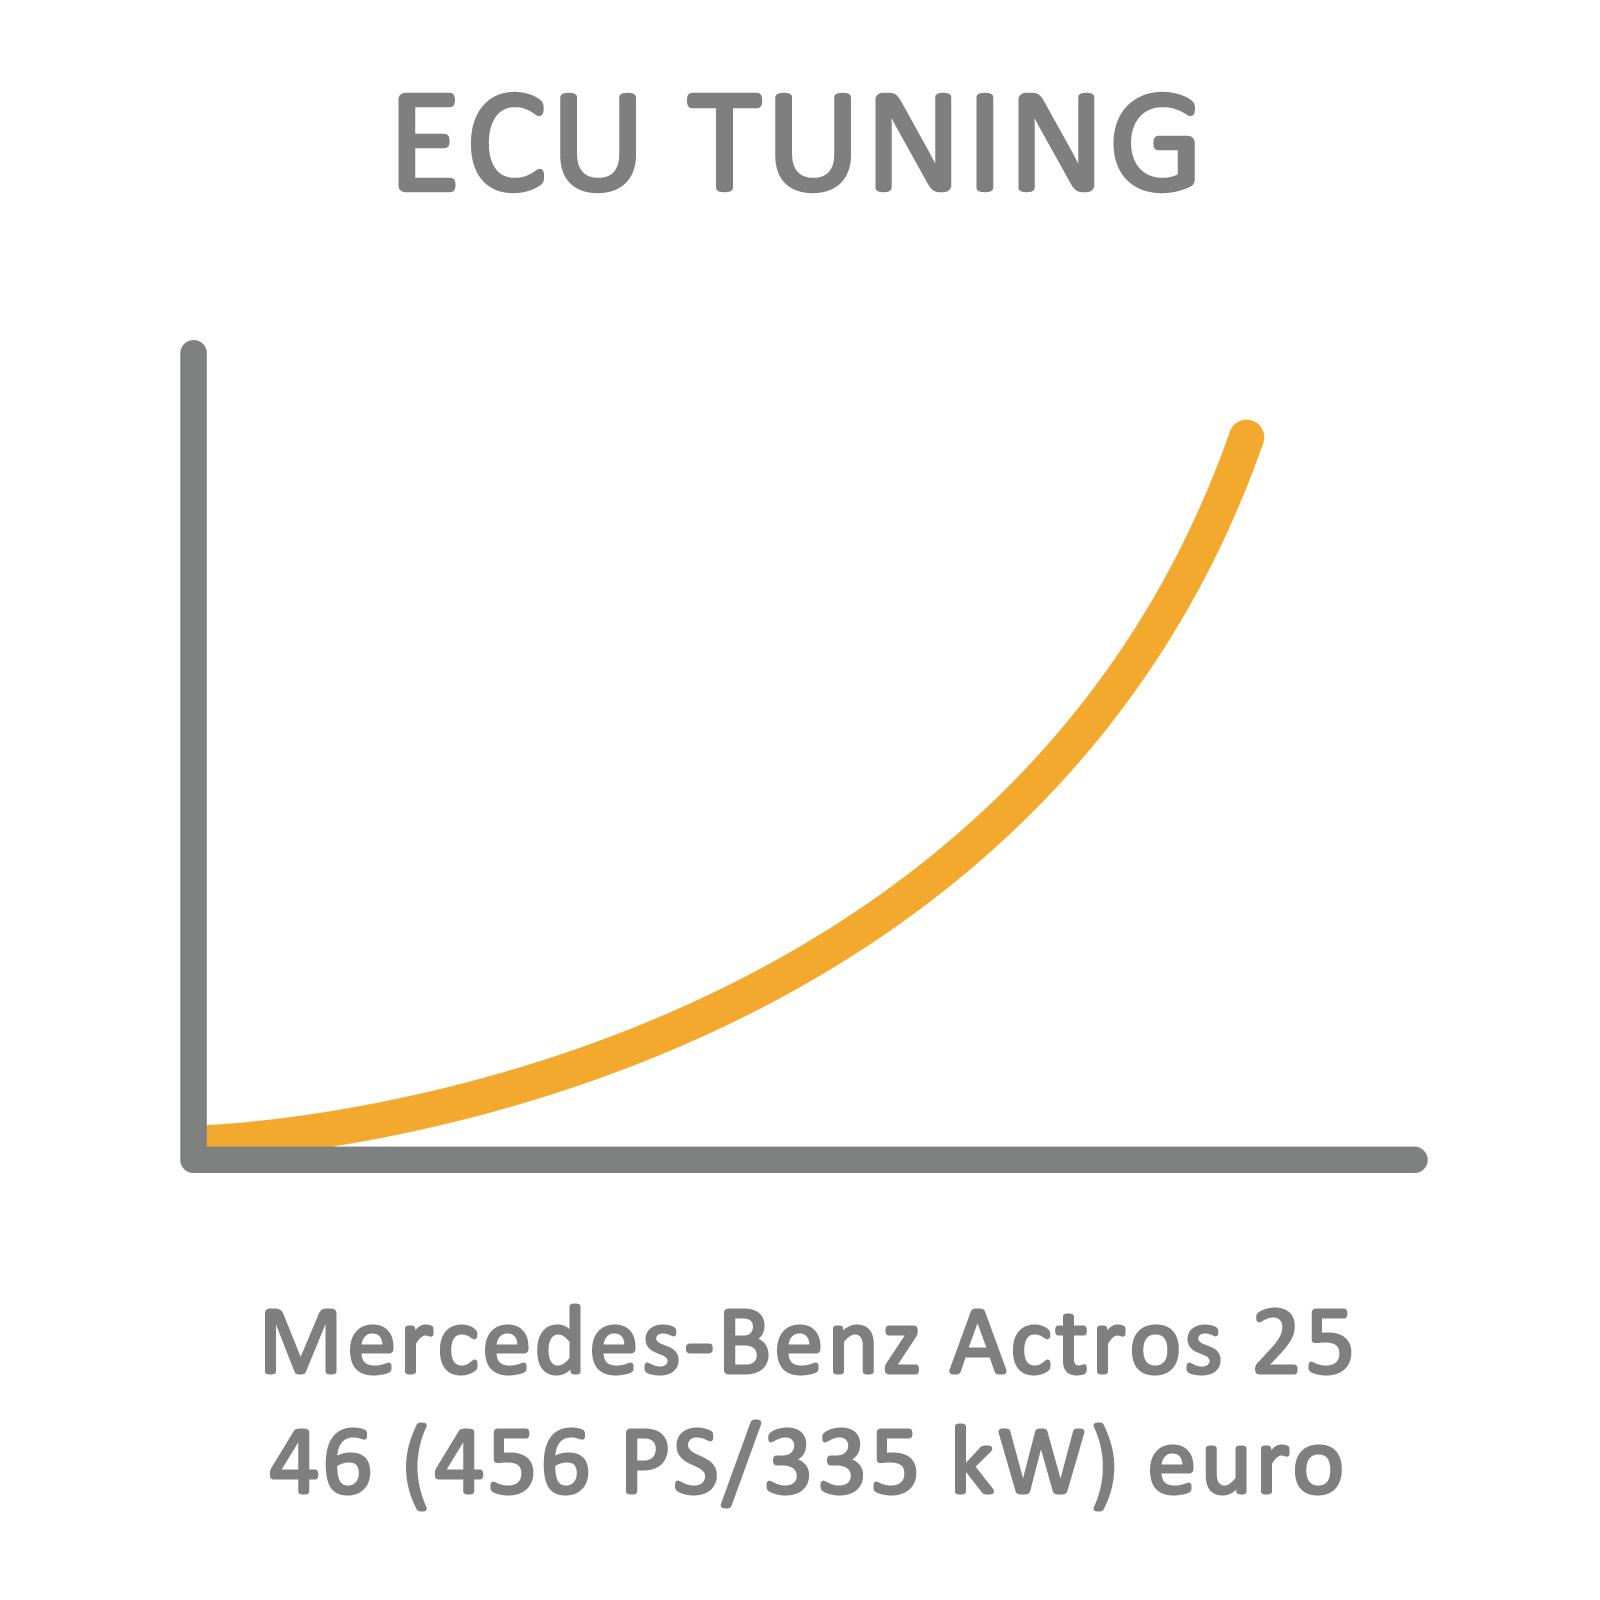 Mercedes-Benz Actros 25 46 (456 PS/335 kW) euro 3+4+5 ECU